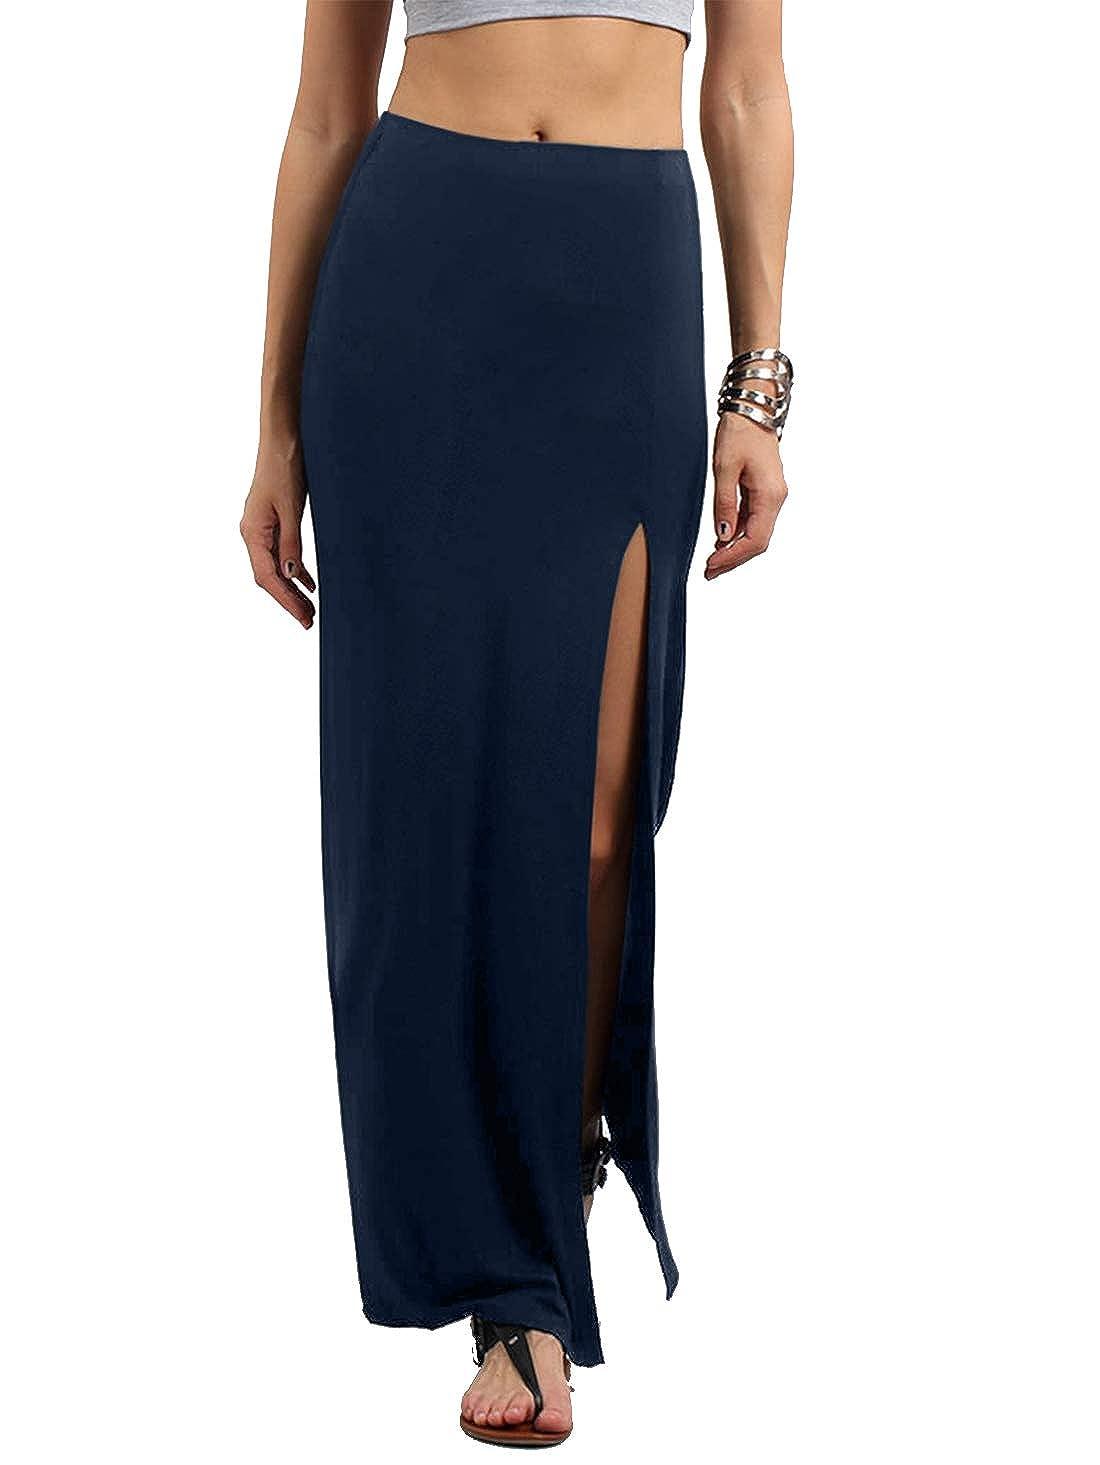 Navy Verdusa Women's Solid color High Waist Side Split Maxi Skirt